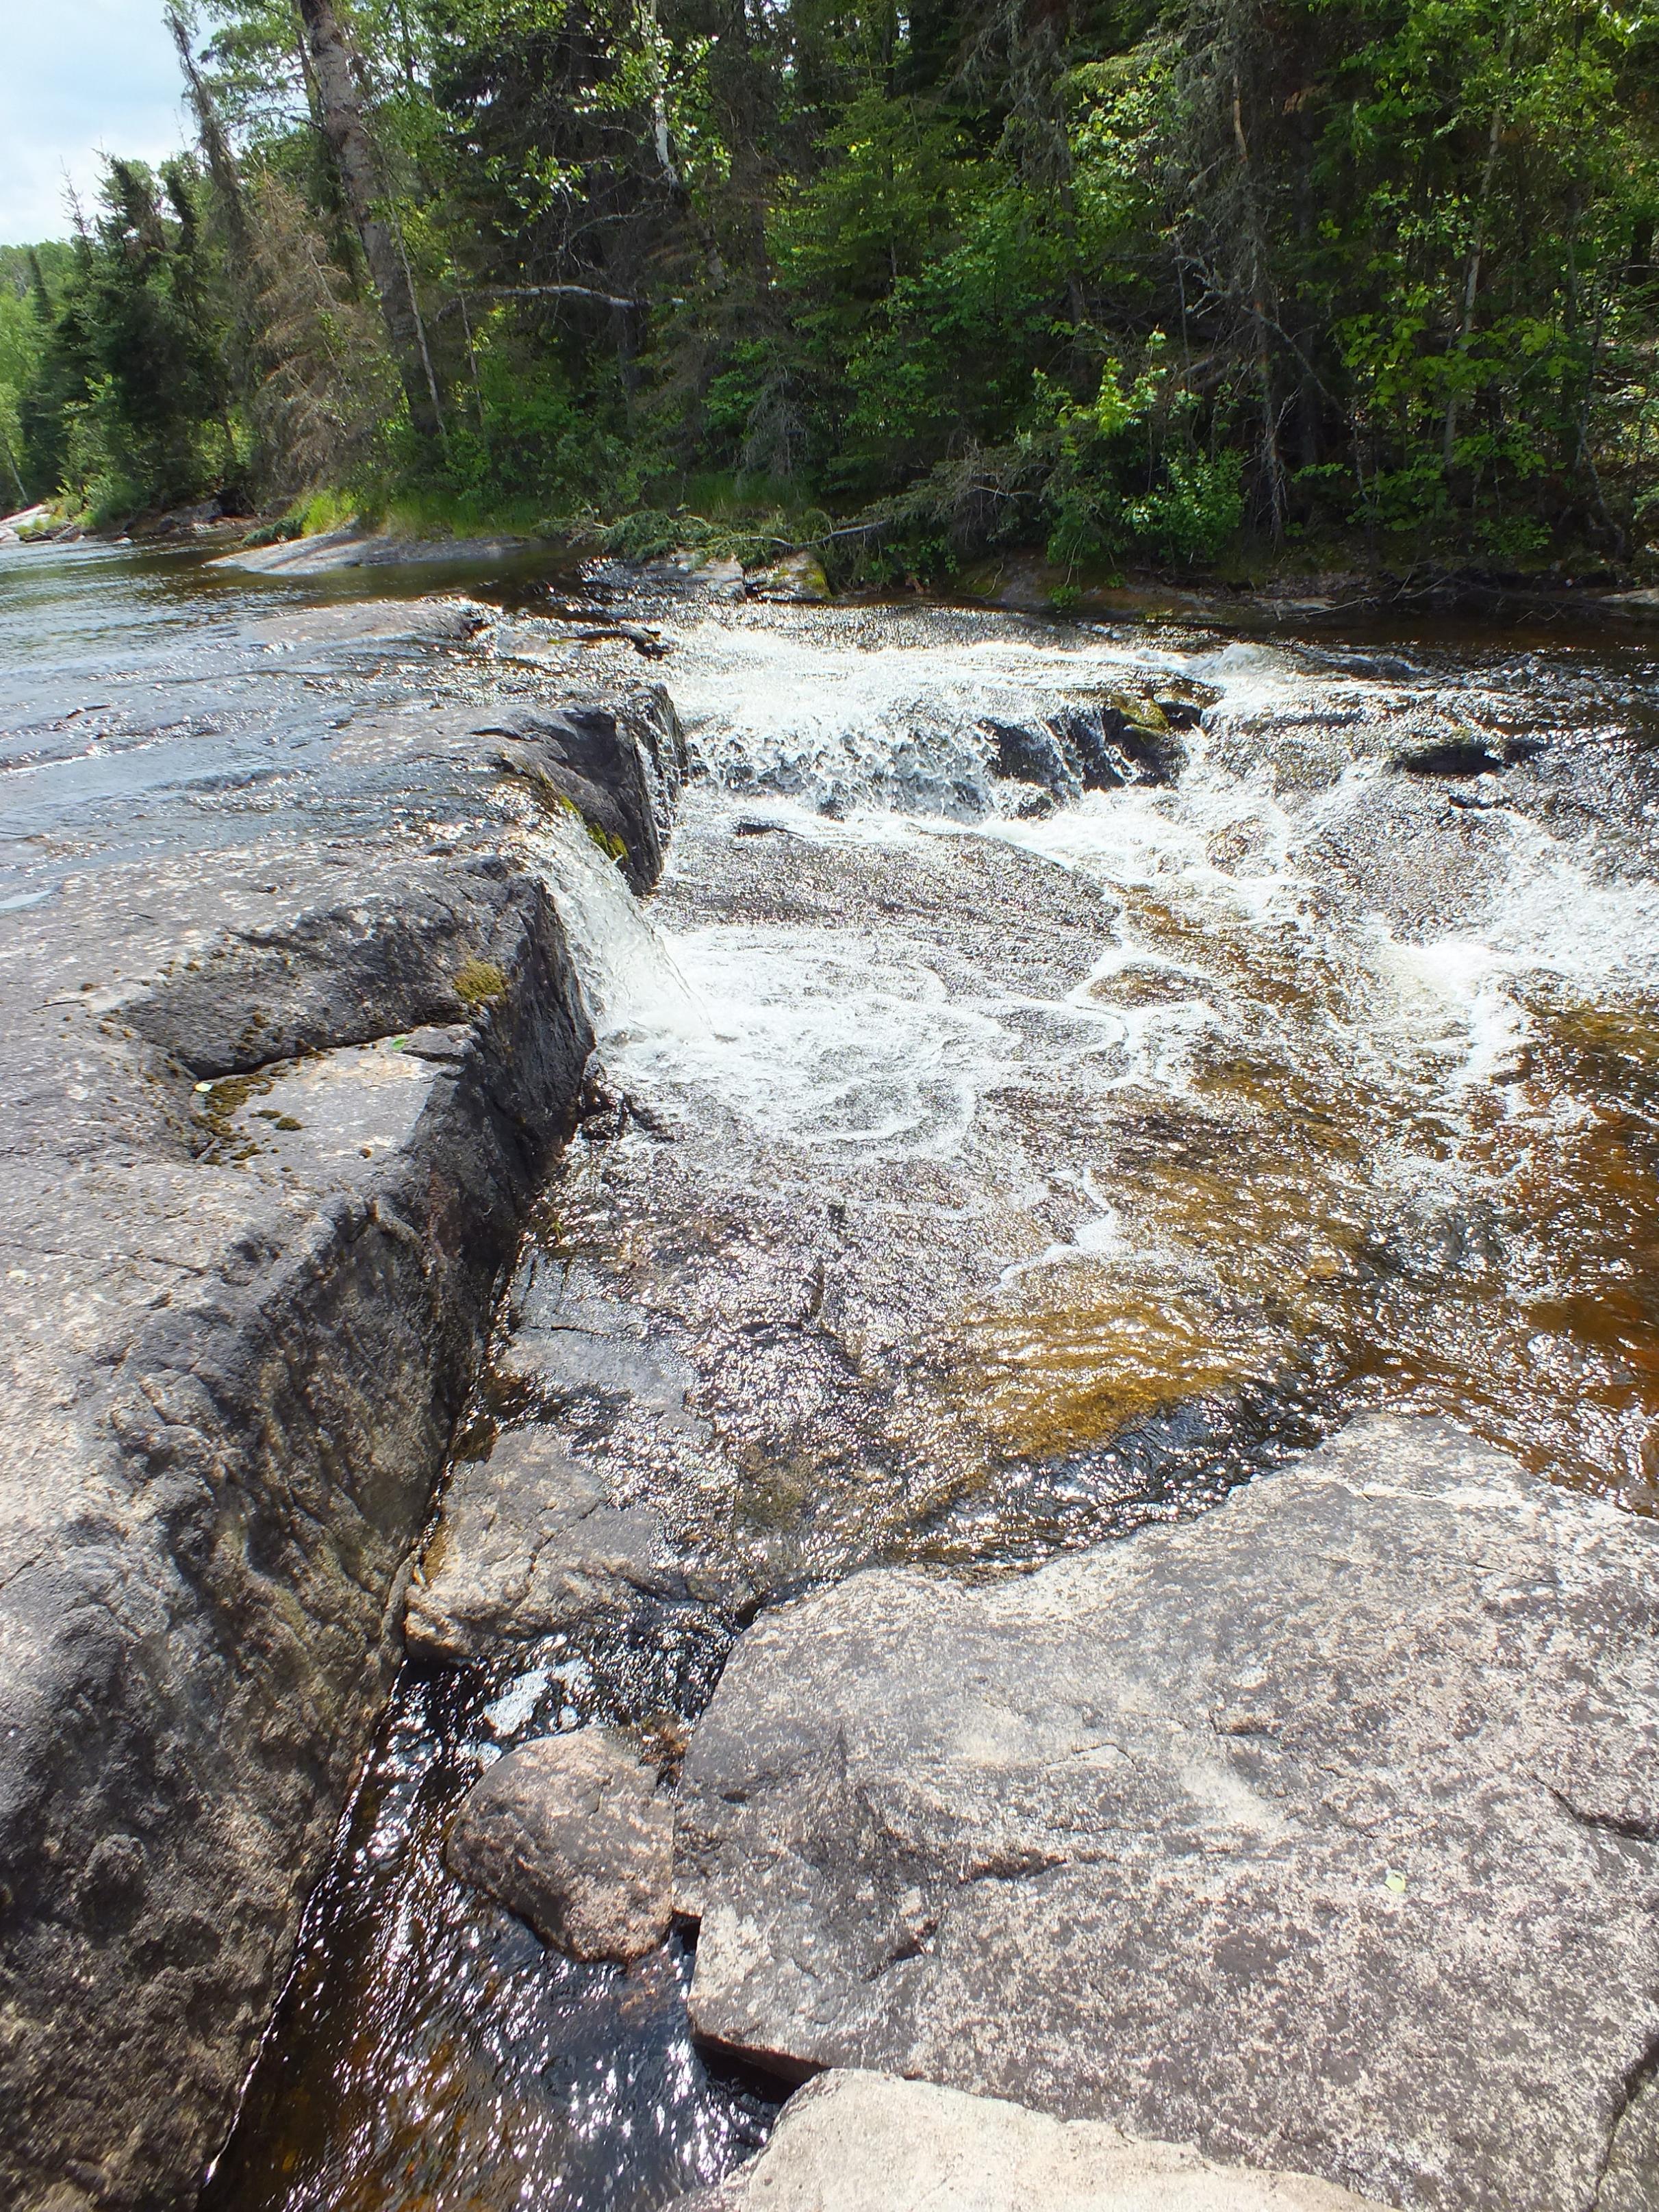 Larus Falls (small side channel)